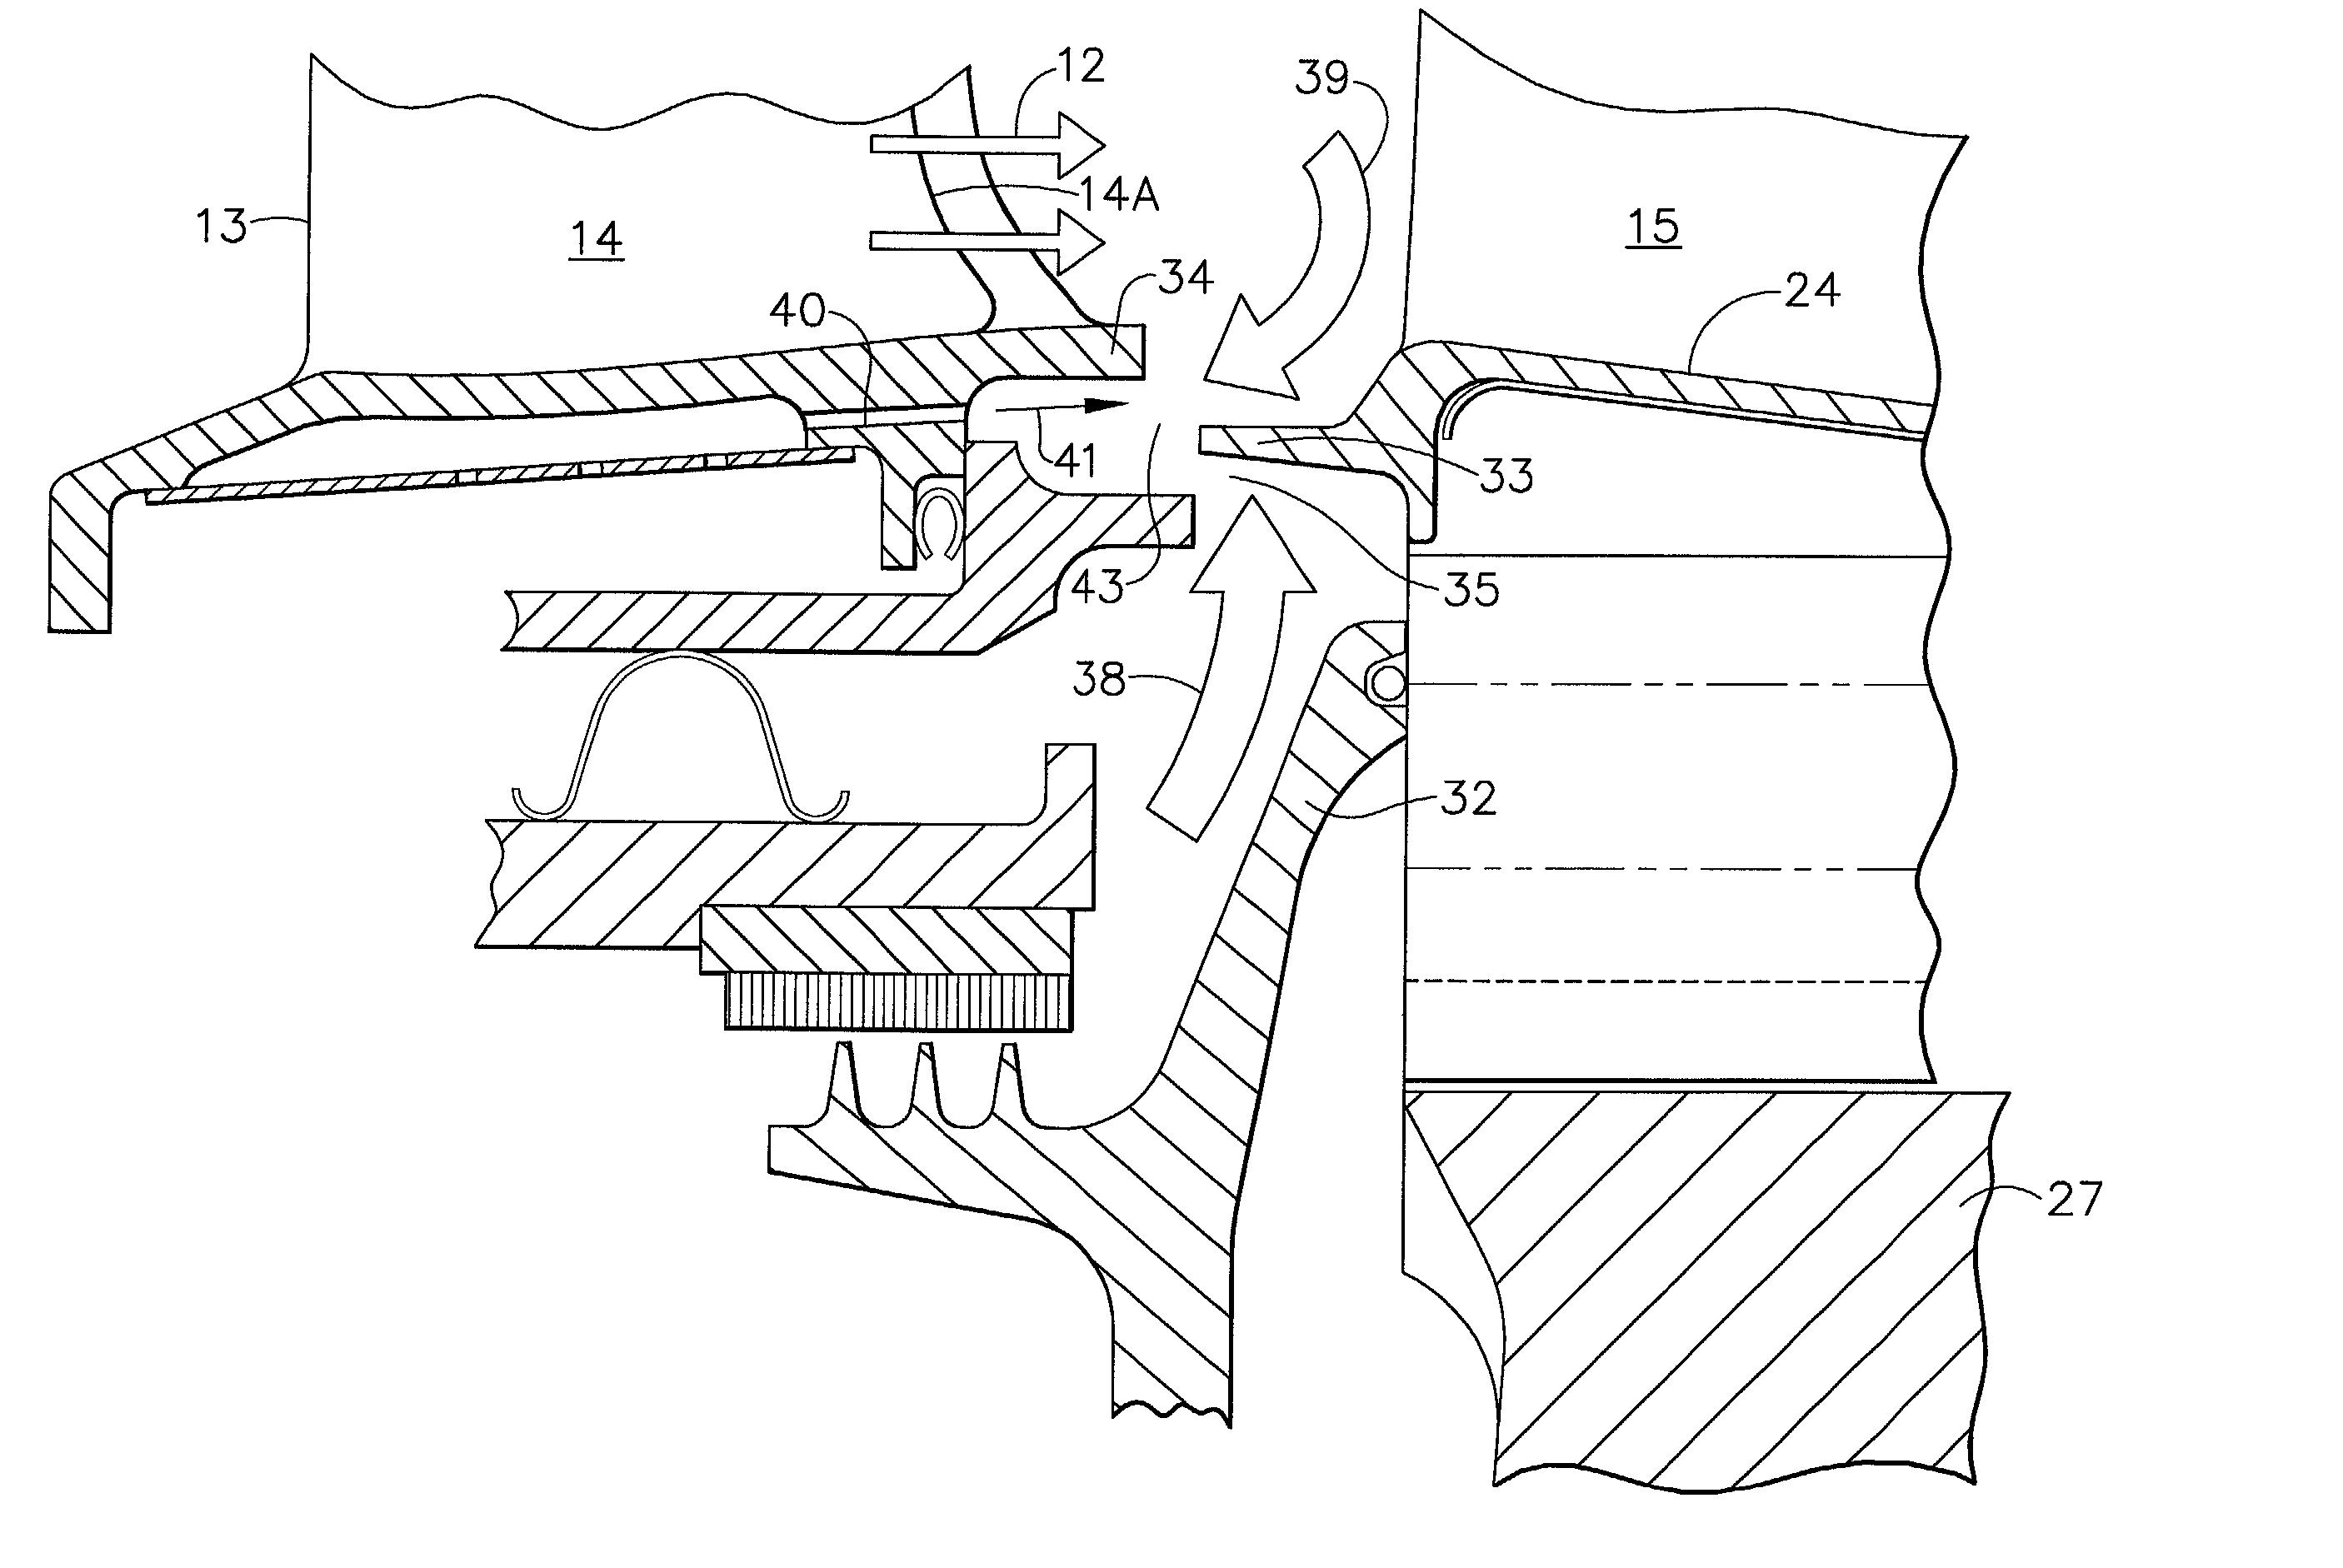 Fan Blade Schematic : Engine fan blade moreover jet turbine diagram on wiring